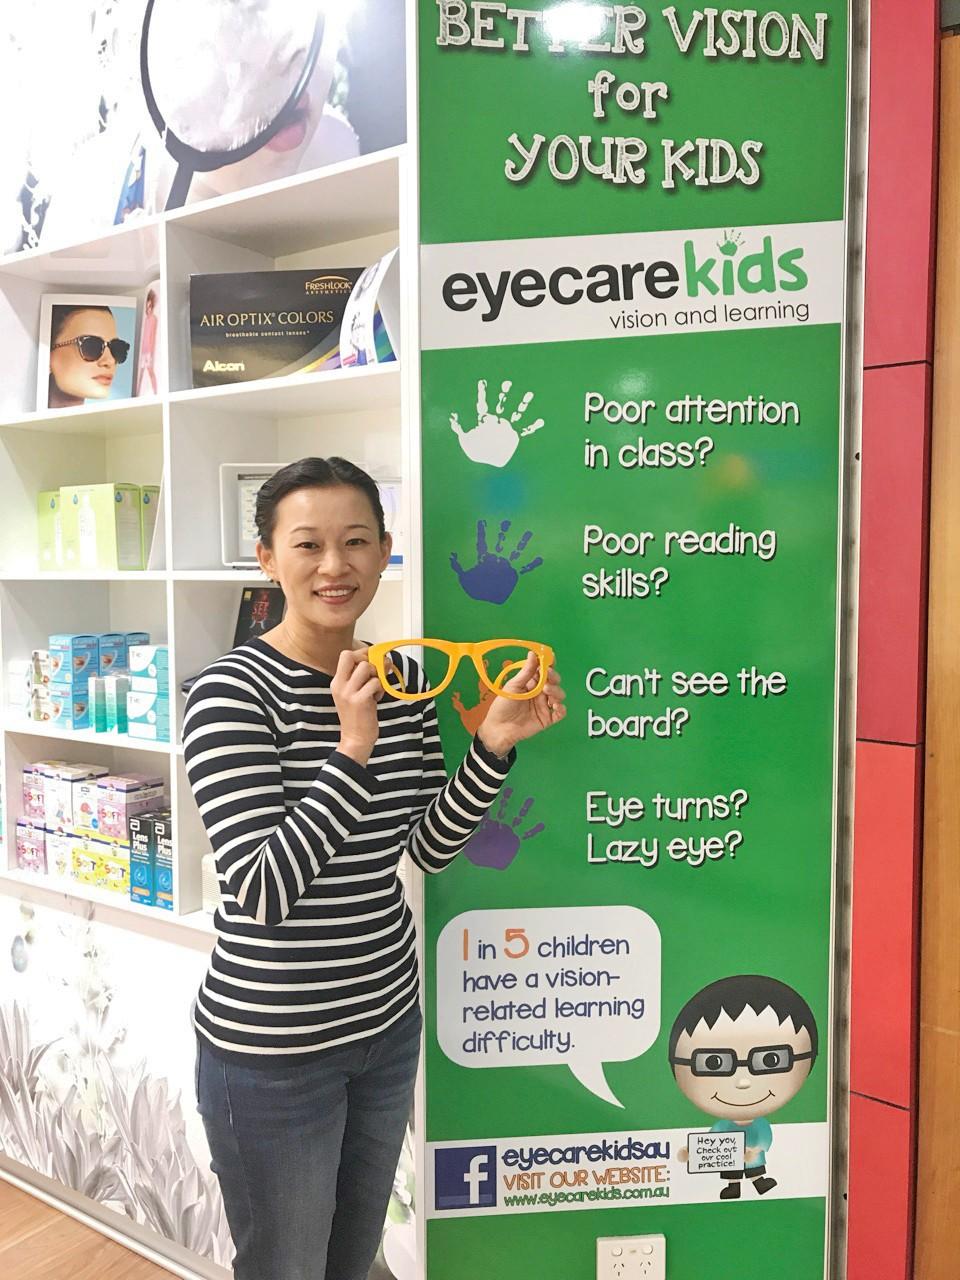 Eyecare Kids Optometrist and Founder, Dr SooJin Nam